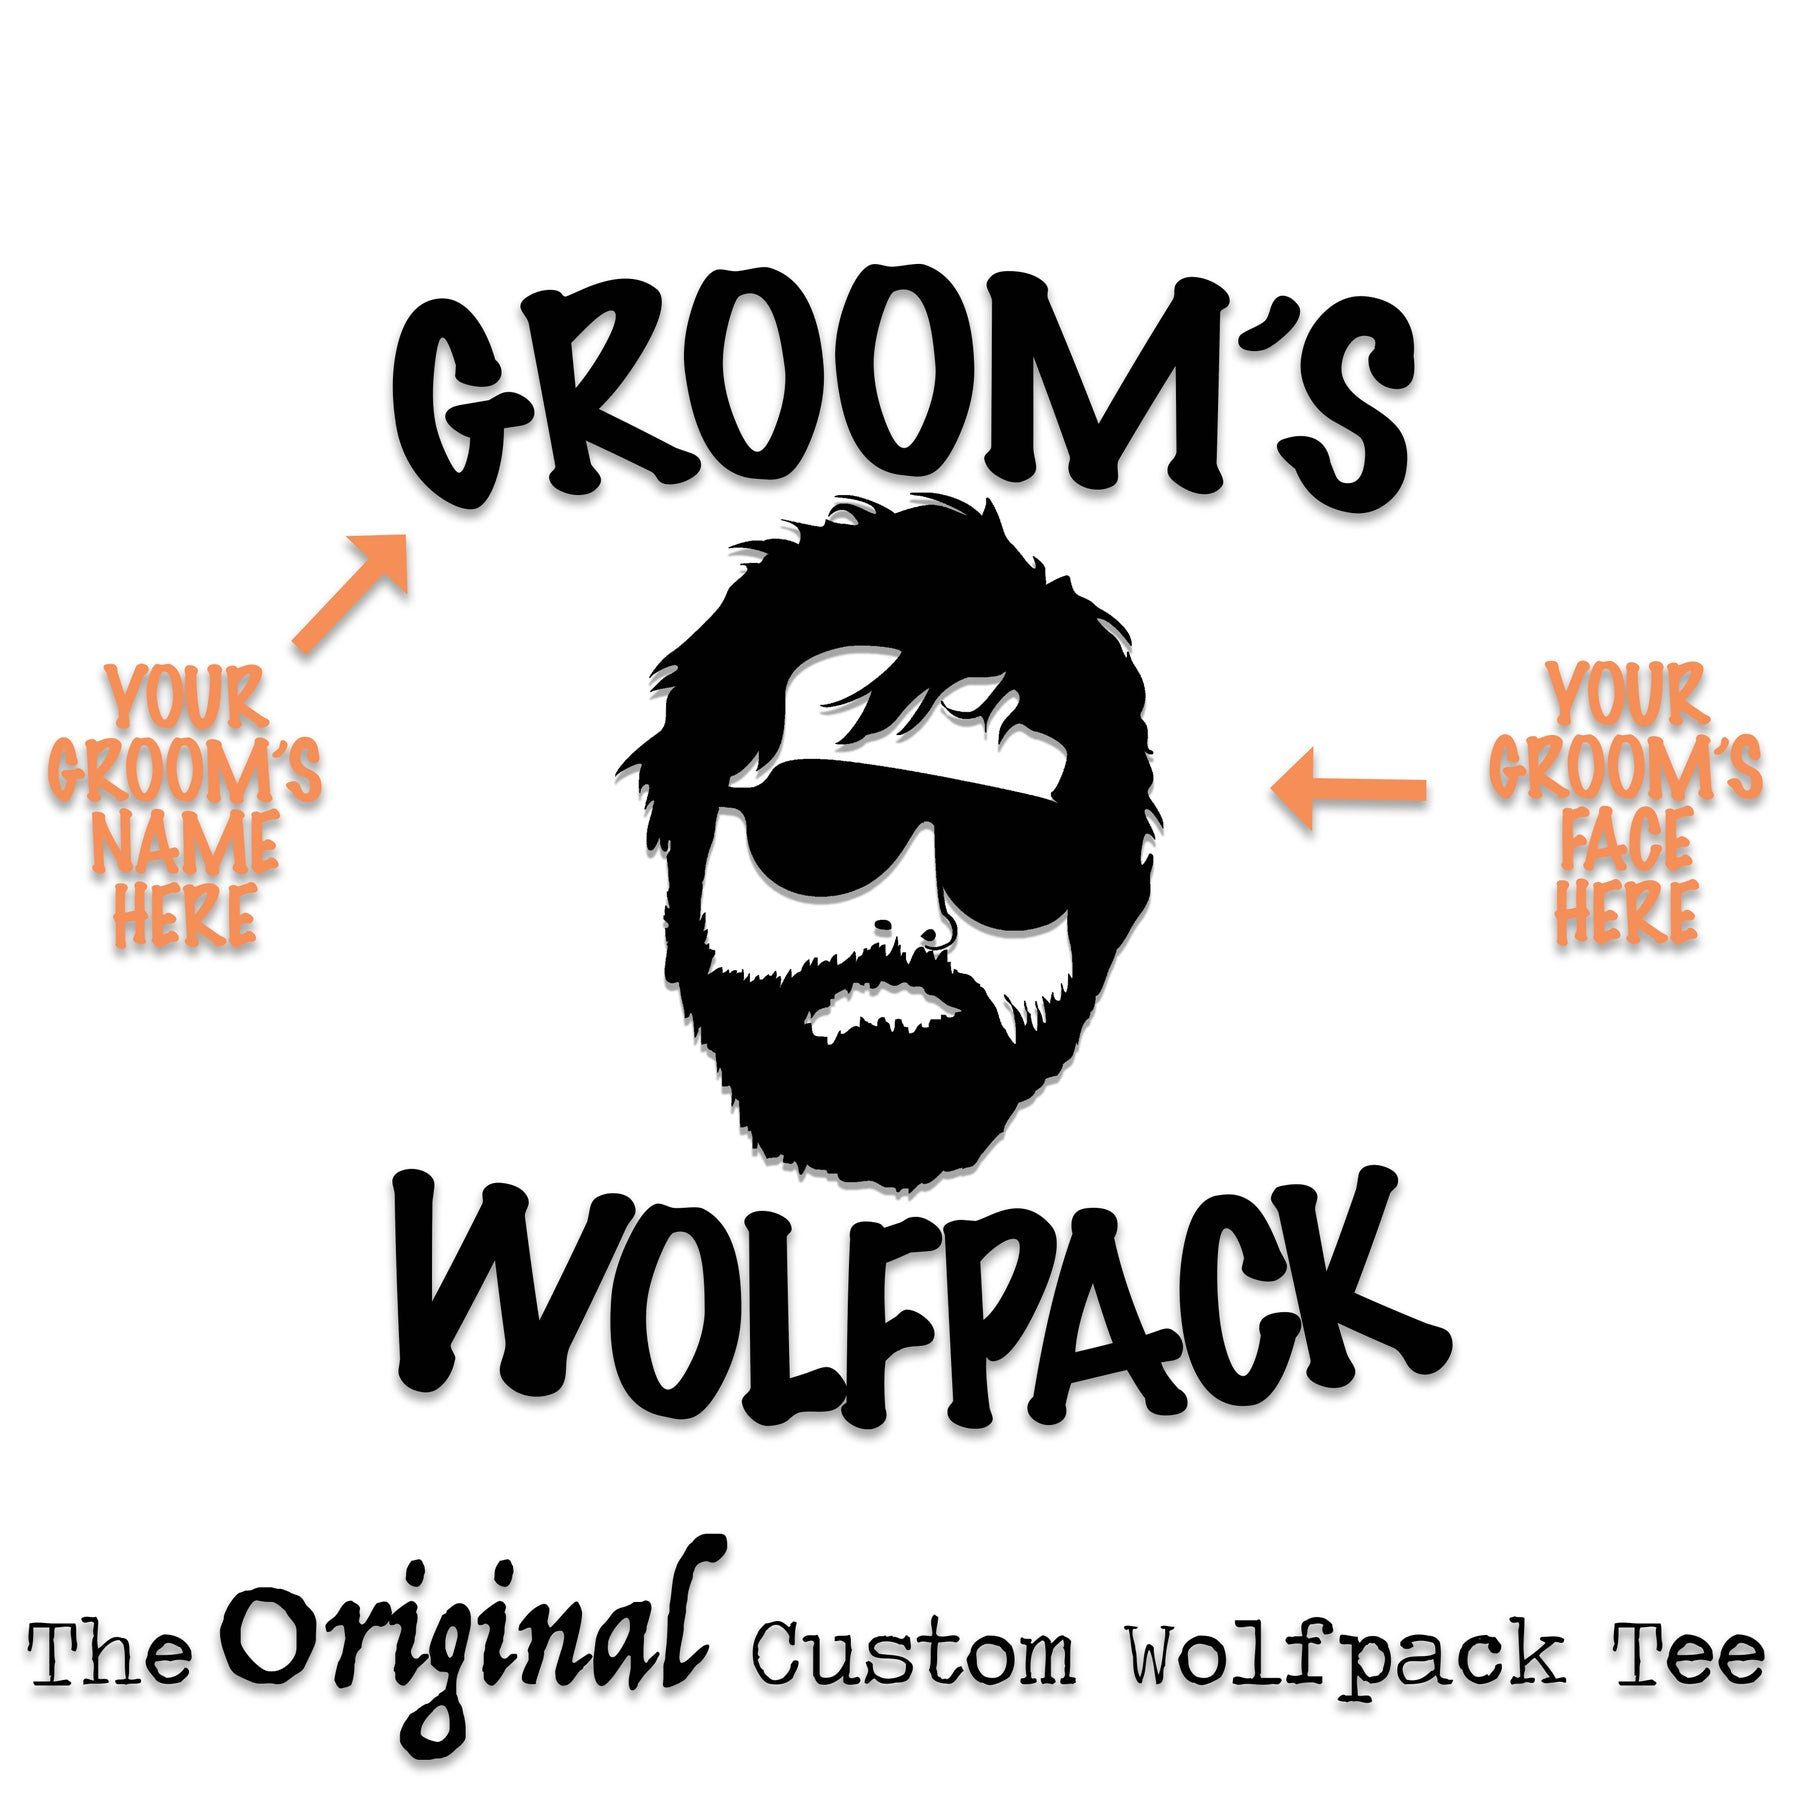 ae3982b191c77 Custom Wolfpack Bachelor Party Tees